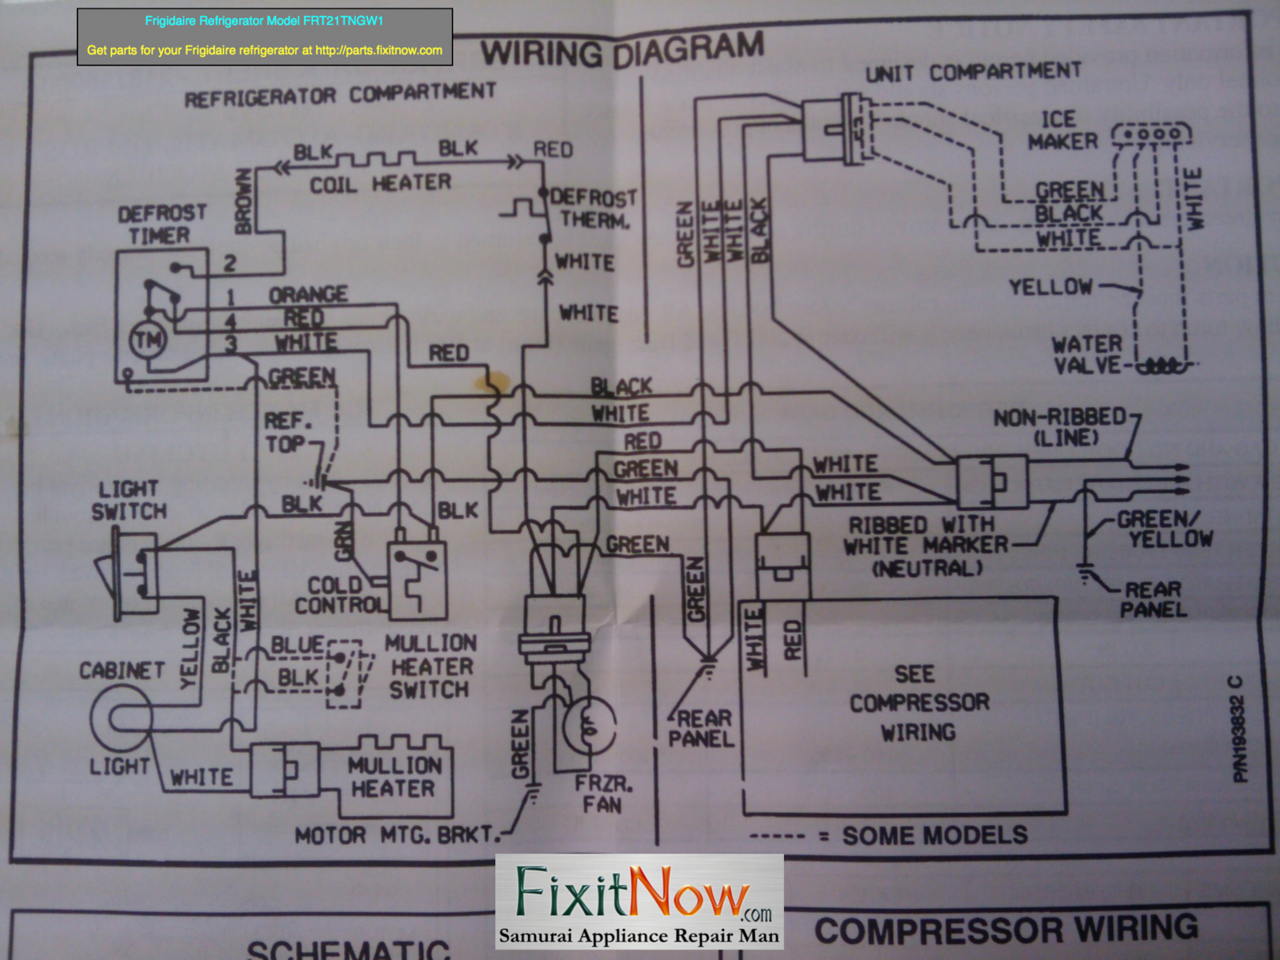 Wiring Diagrams And Schematics - Appliantology - Whirlpool Refrigerator Wiring Diagram